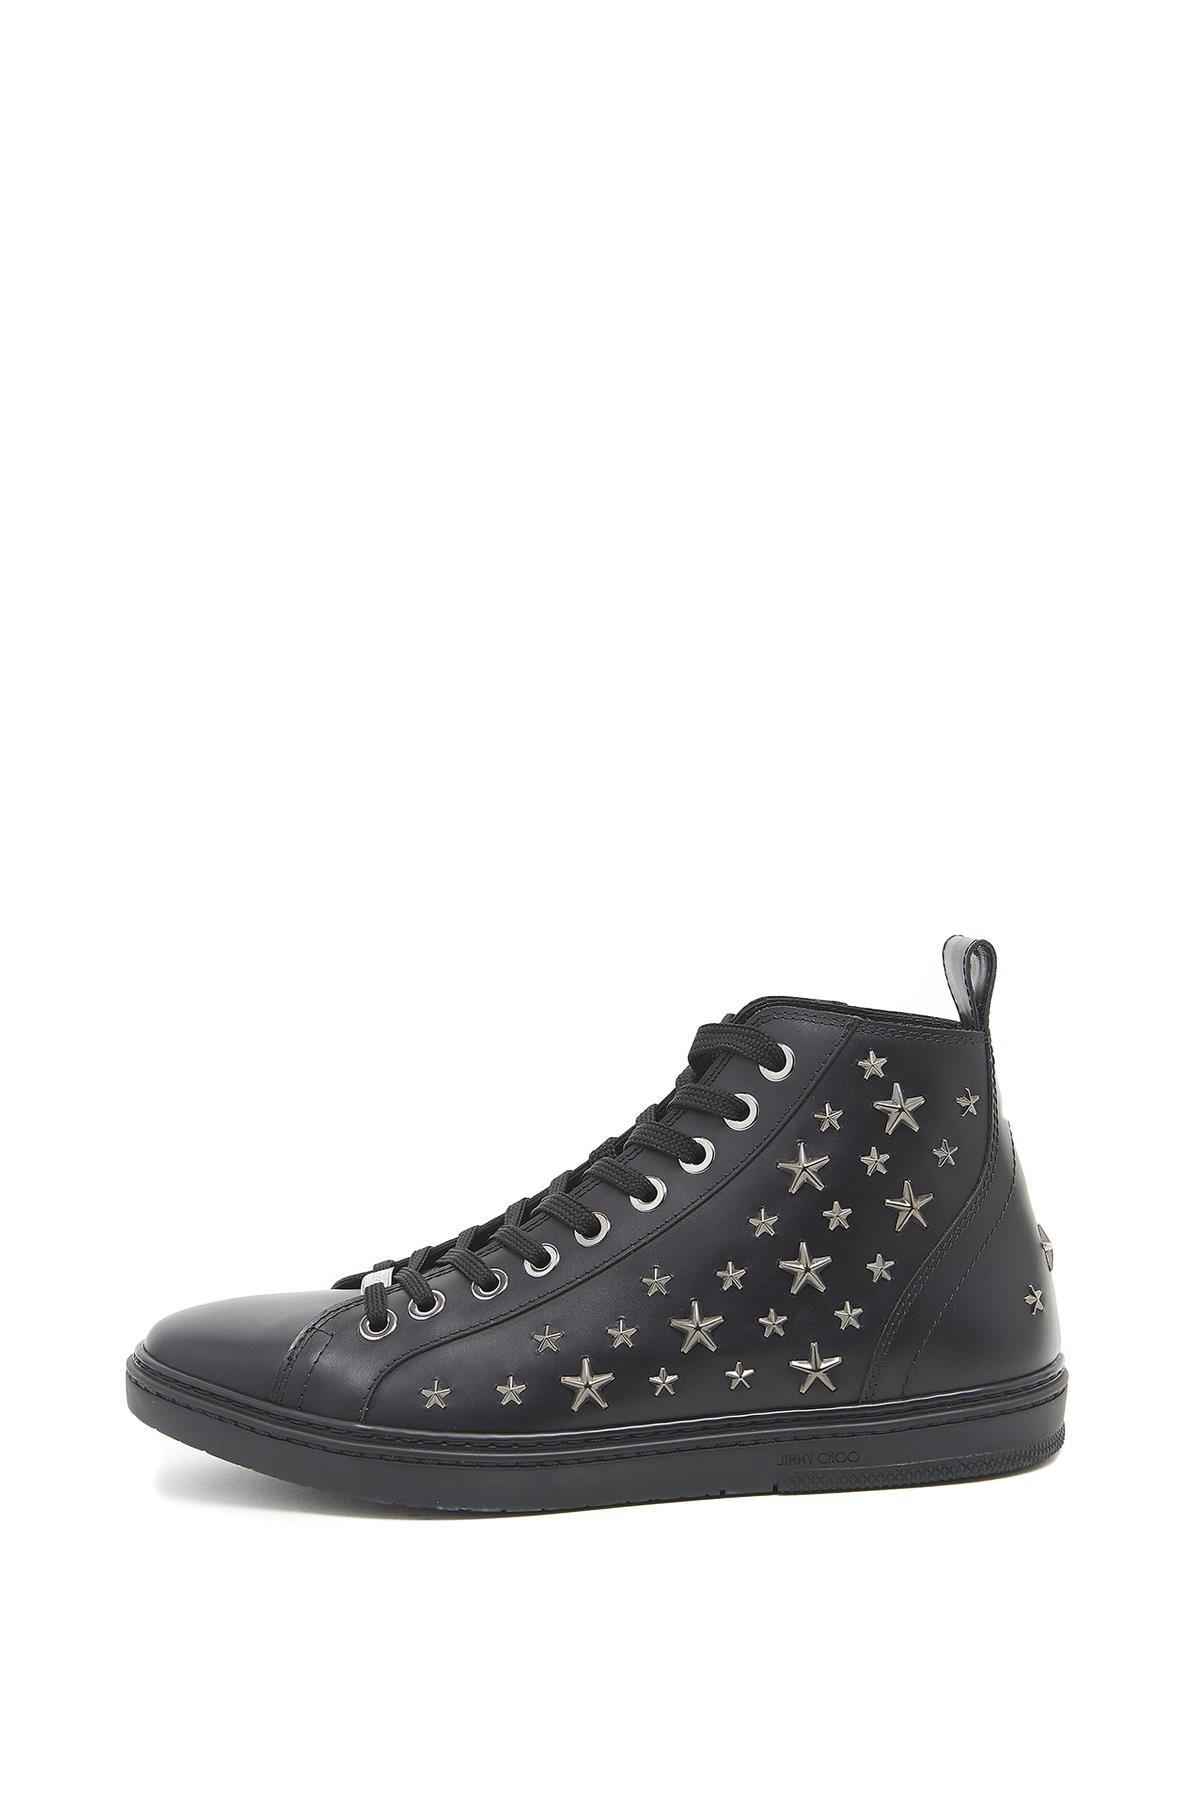 7511f49da999 jimmy choo  colt  sneakers available on julian-fashion.com - 48943